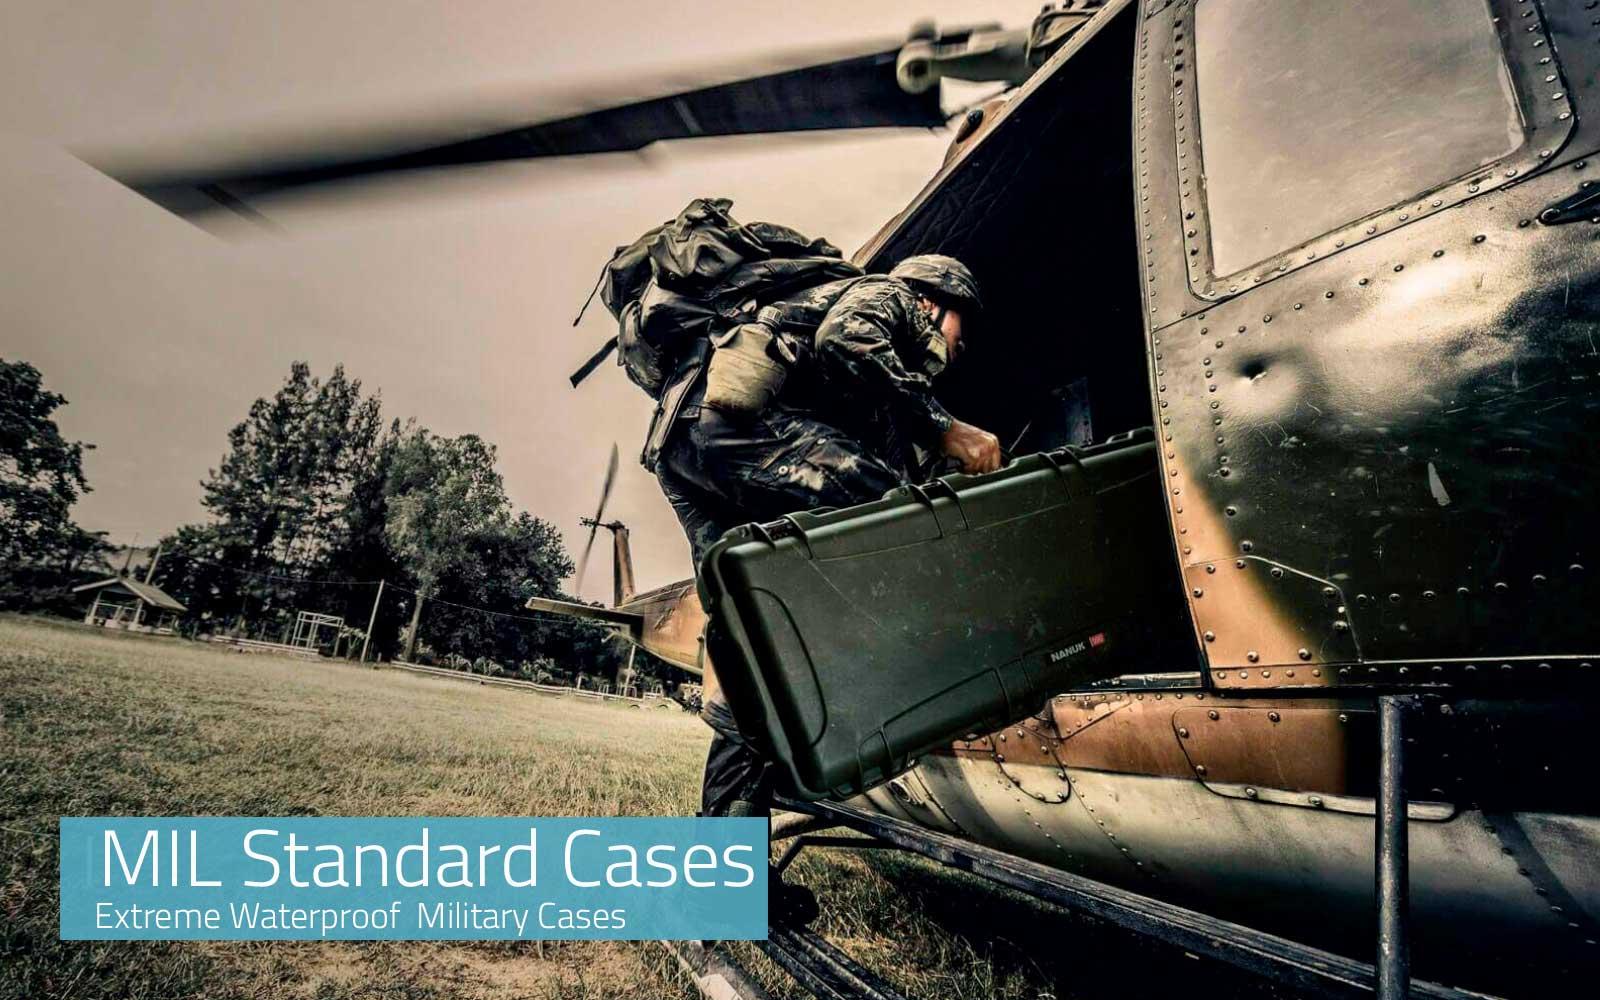 Military Waterproof Cases